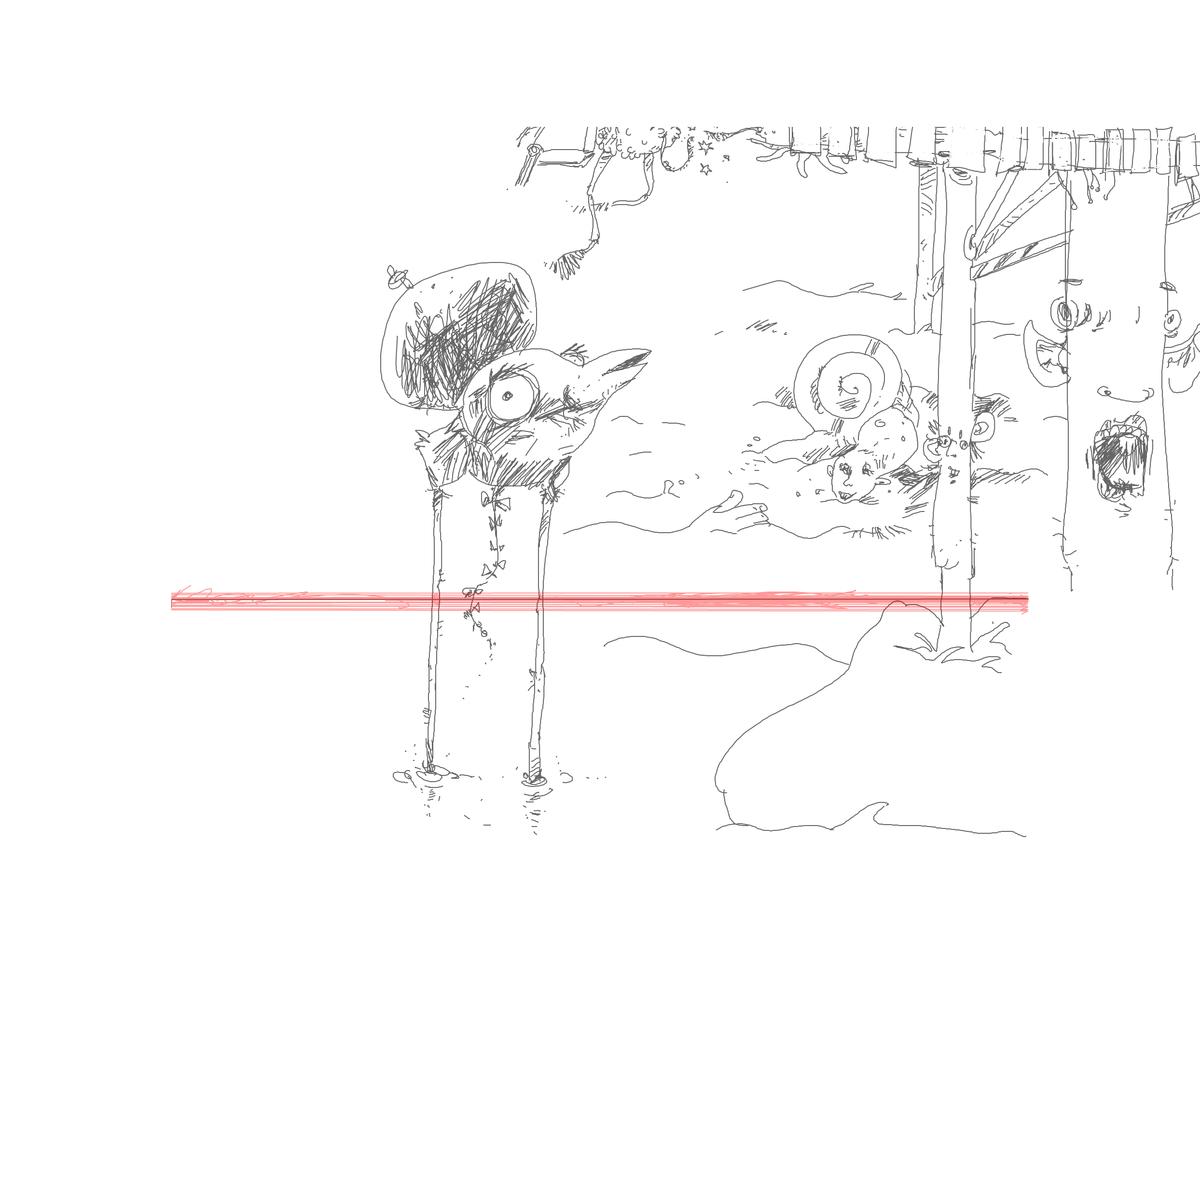 BAAAM drawing#18101 lat:78.4207305908203100lng: -4.4904322624206540